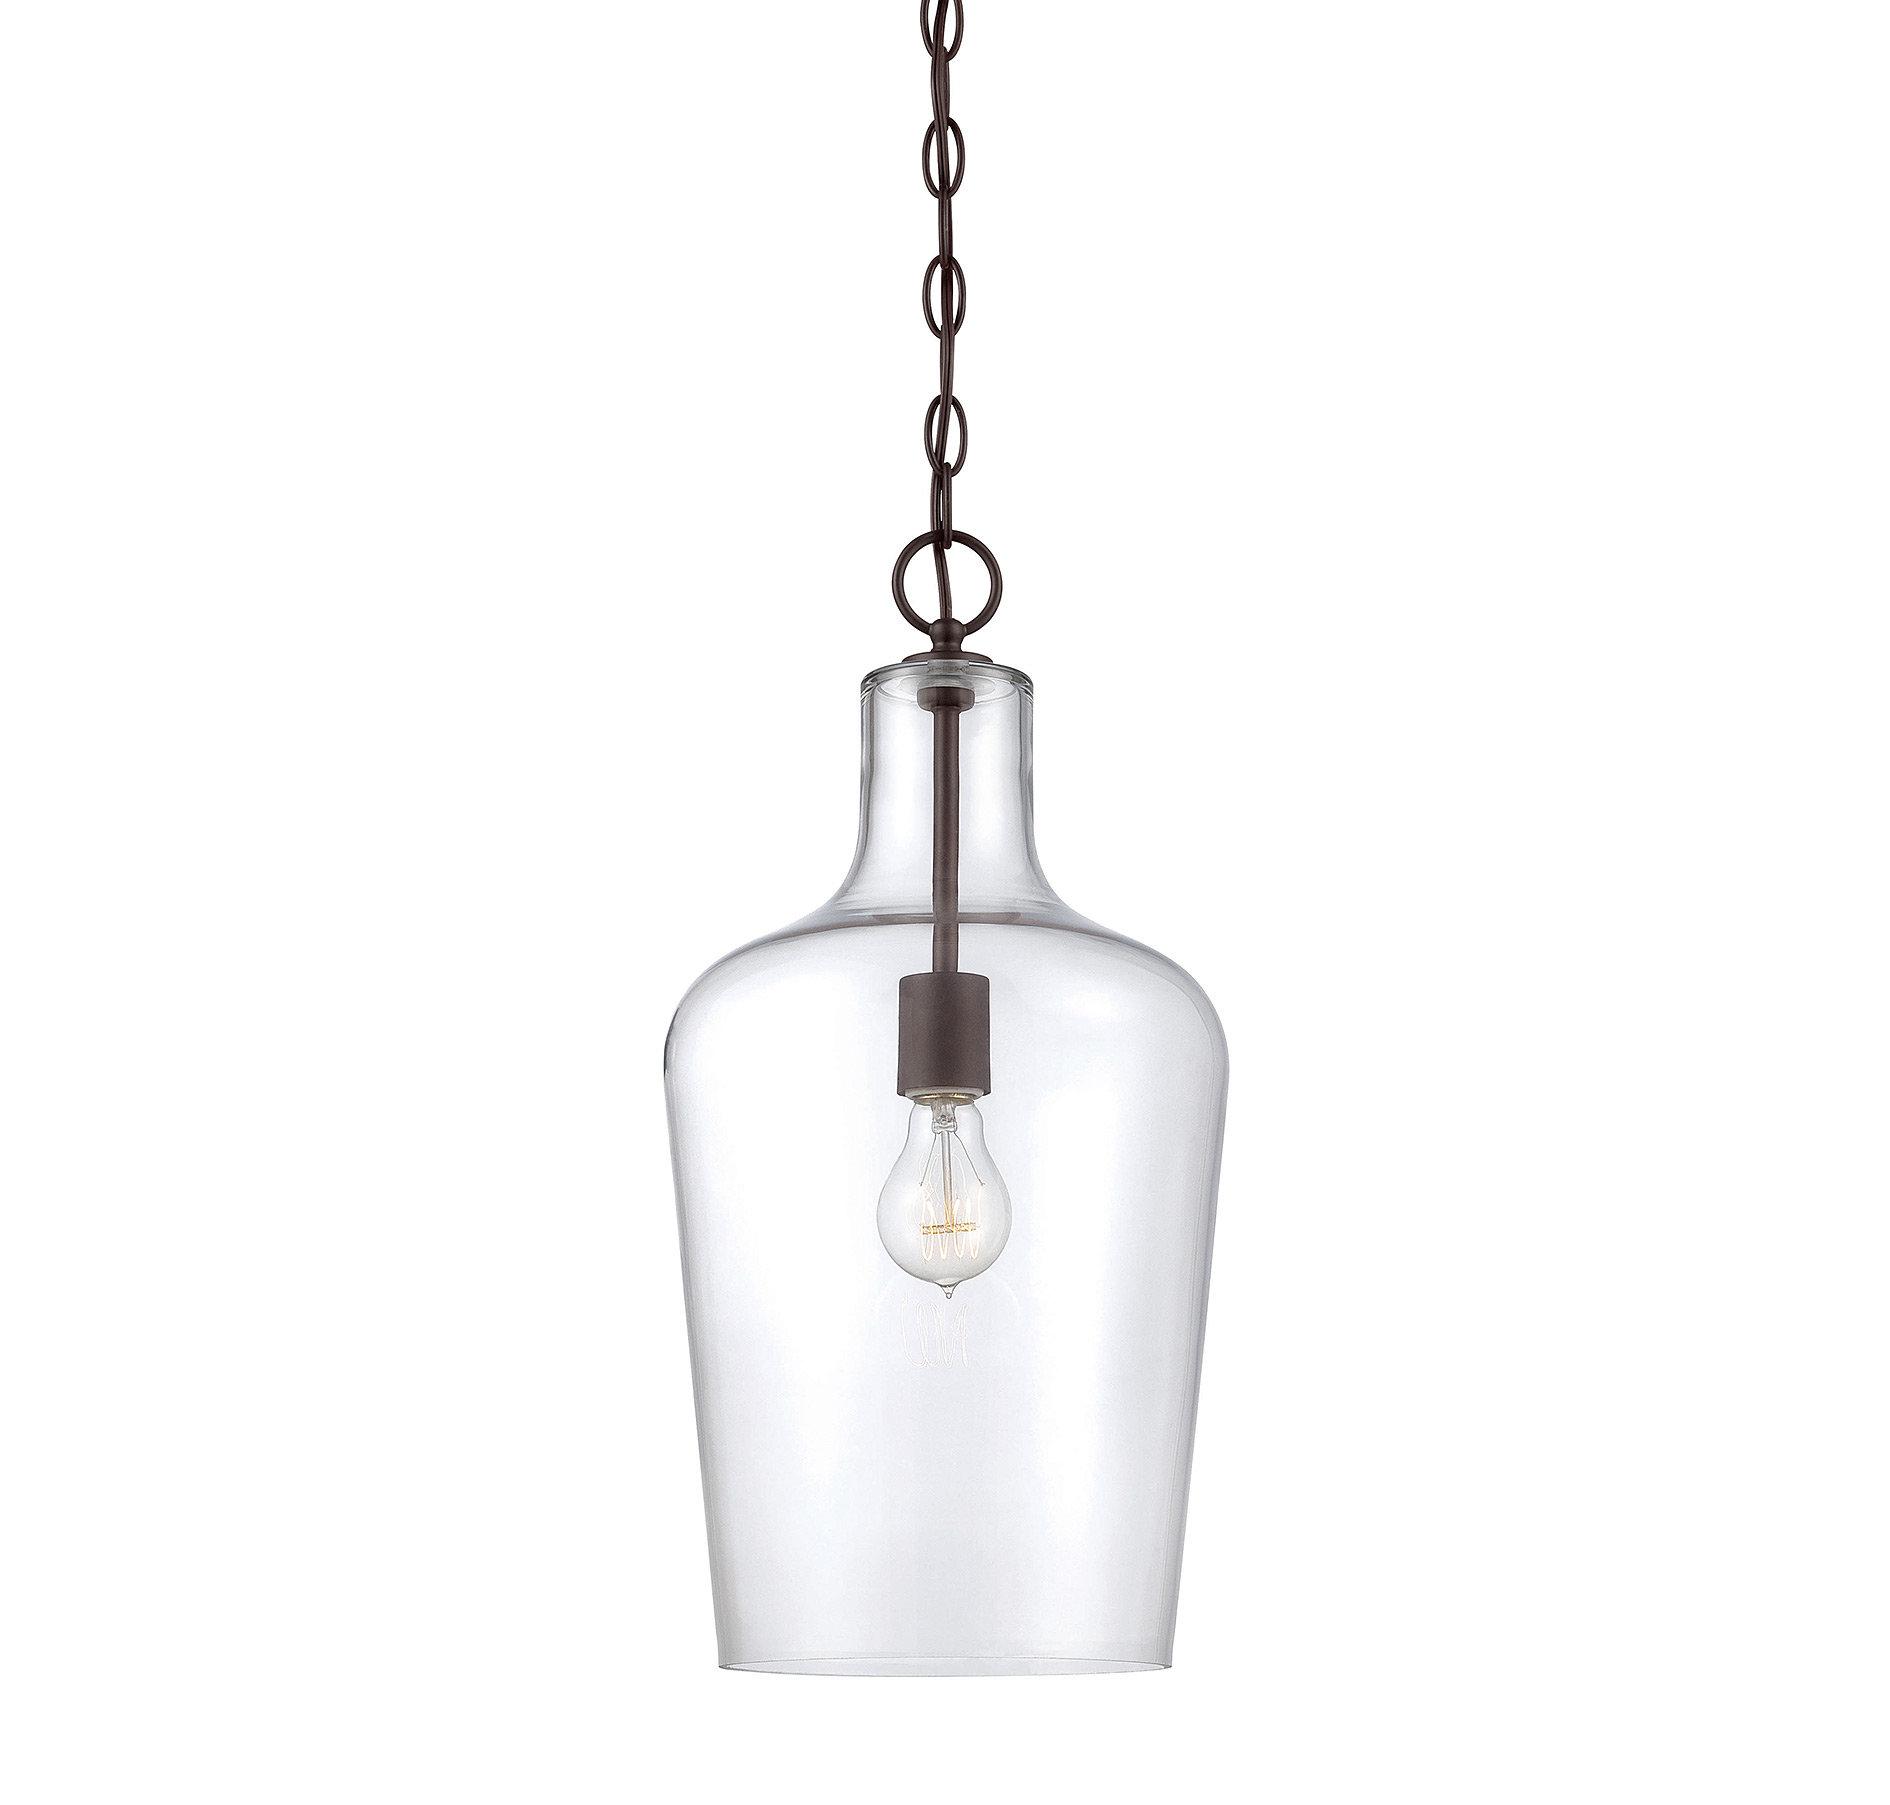 Carey 1 Light Single Bell Pendant Pertaining To Carey 1 Light Single Bell Pendants (View 11 of 30)